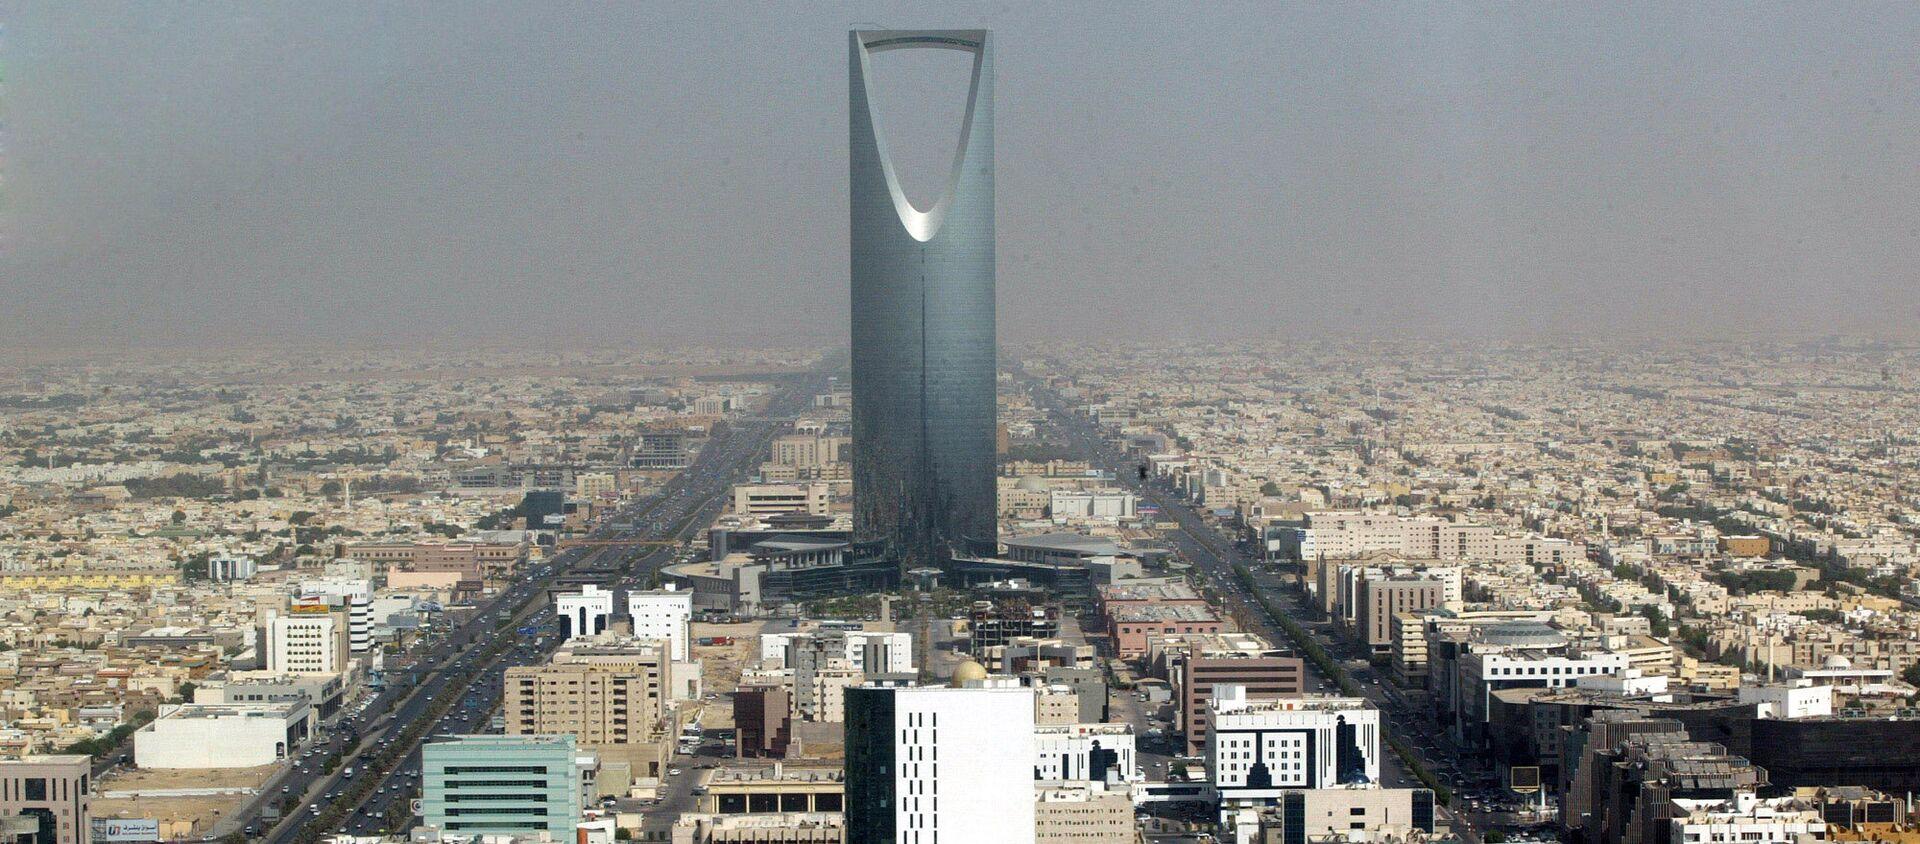 La capitale dell'Arabia Saudita Riad - Sputnik Italia, 1920, 20.05.2020